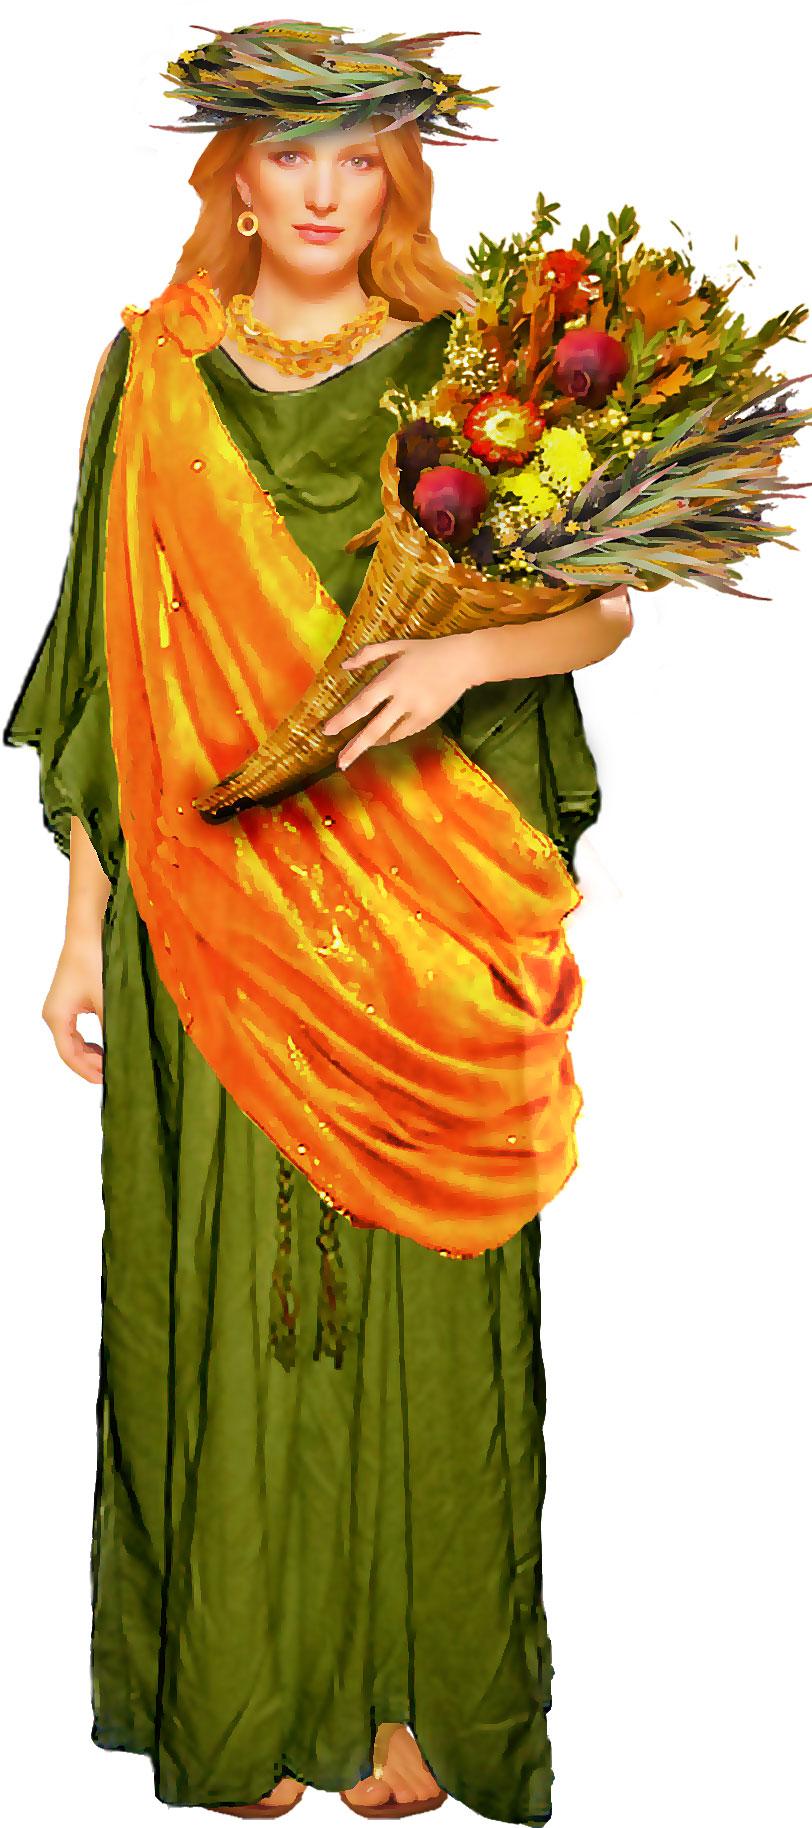 Demeter Greek Goddess Quotes. QuotesGram